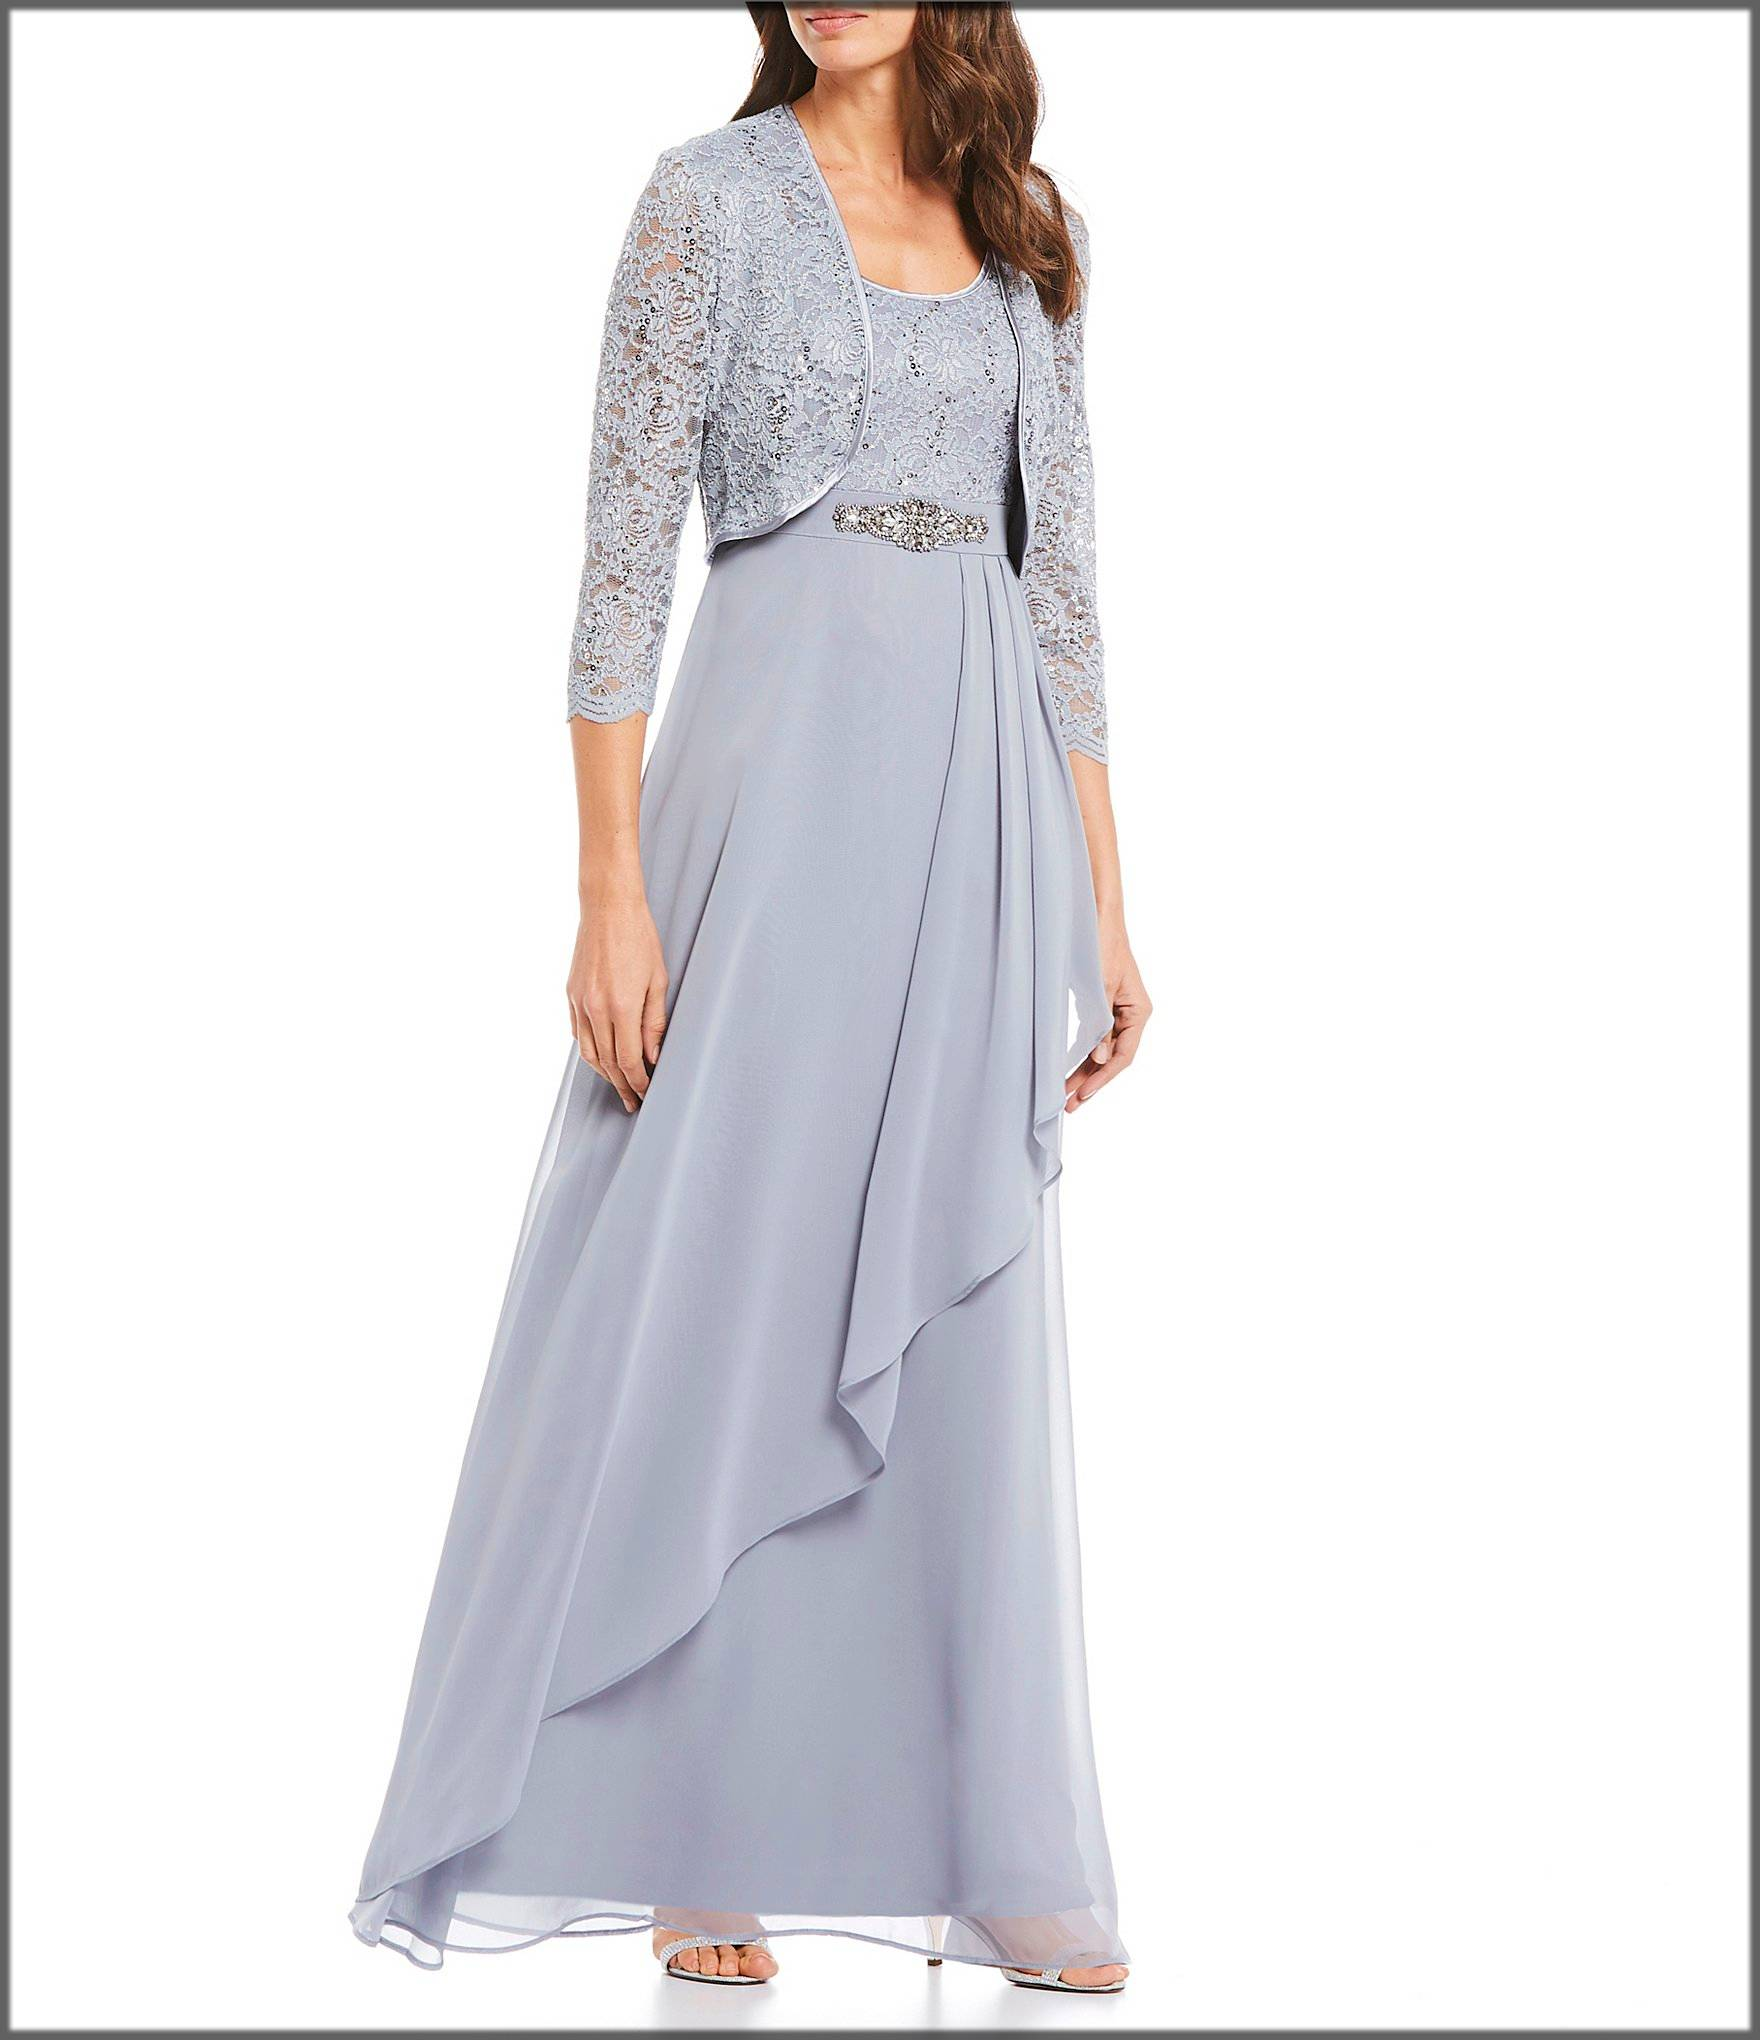 Chiffon ruffle long gown with lace jacket